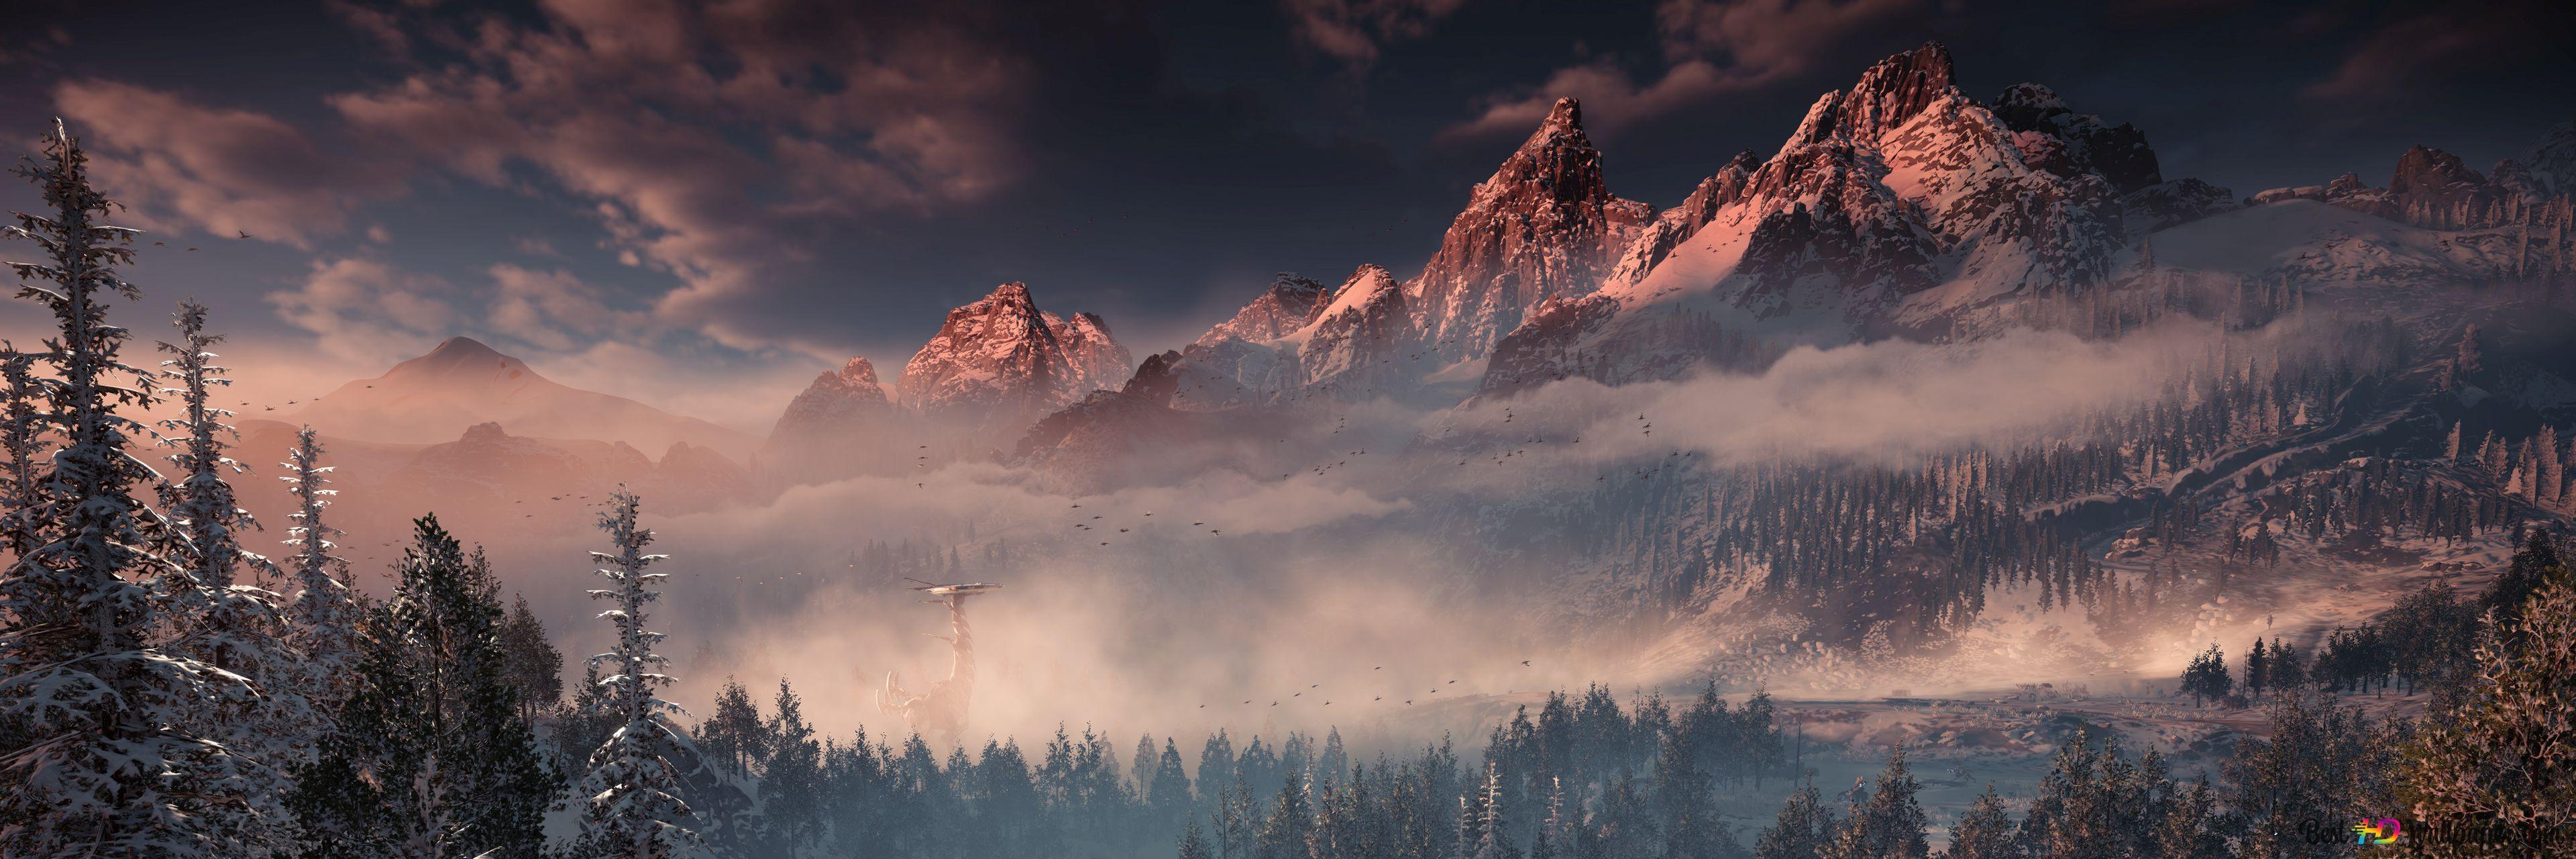 Horizon Zero Dawn The Frozen Wilds Hd Wallpaper Download